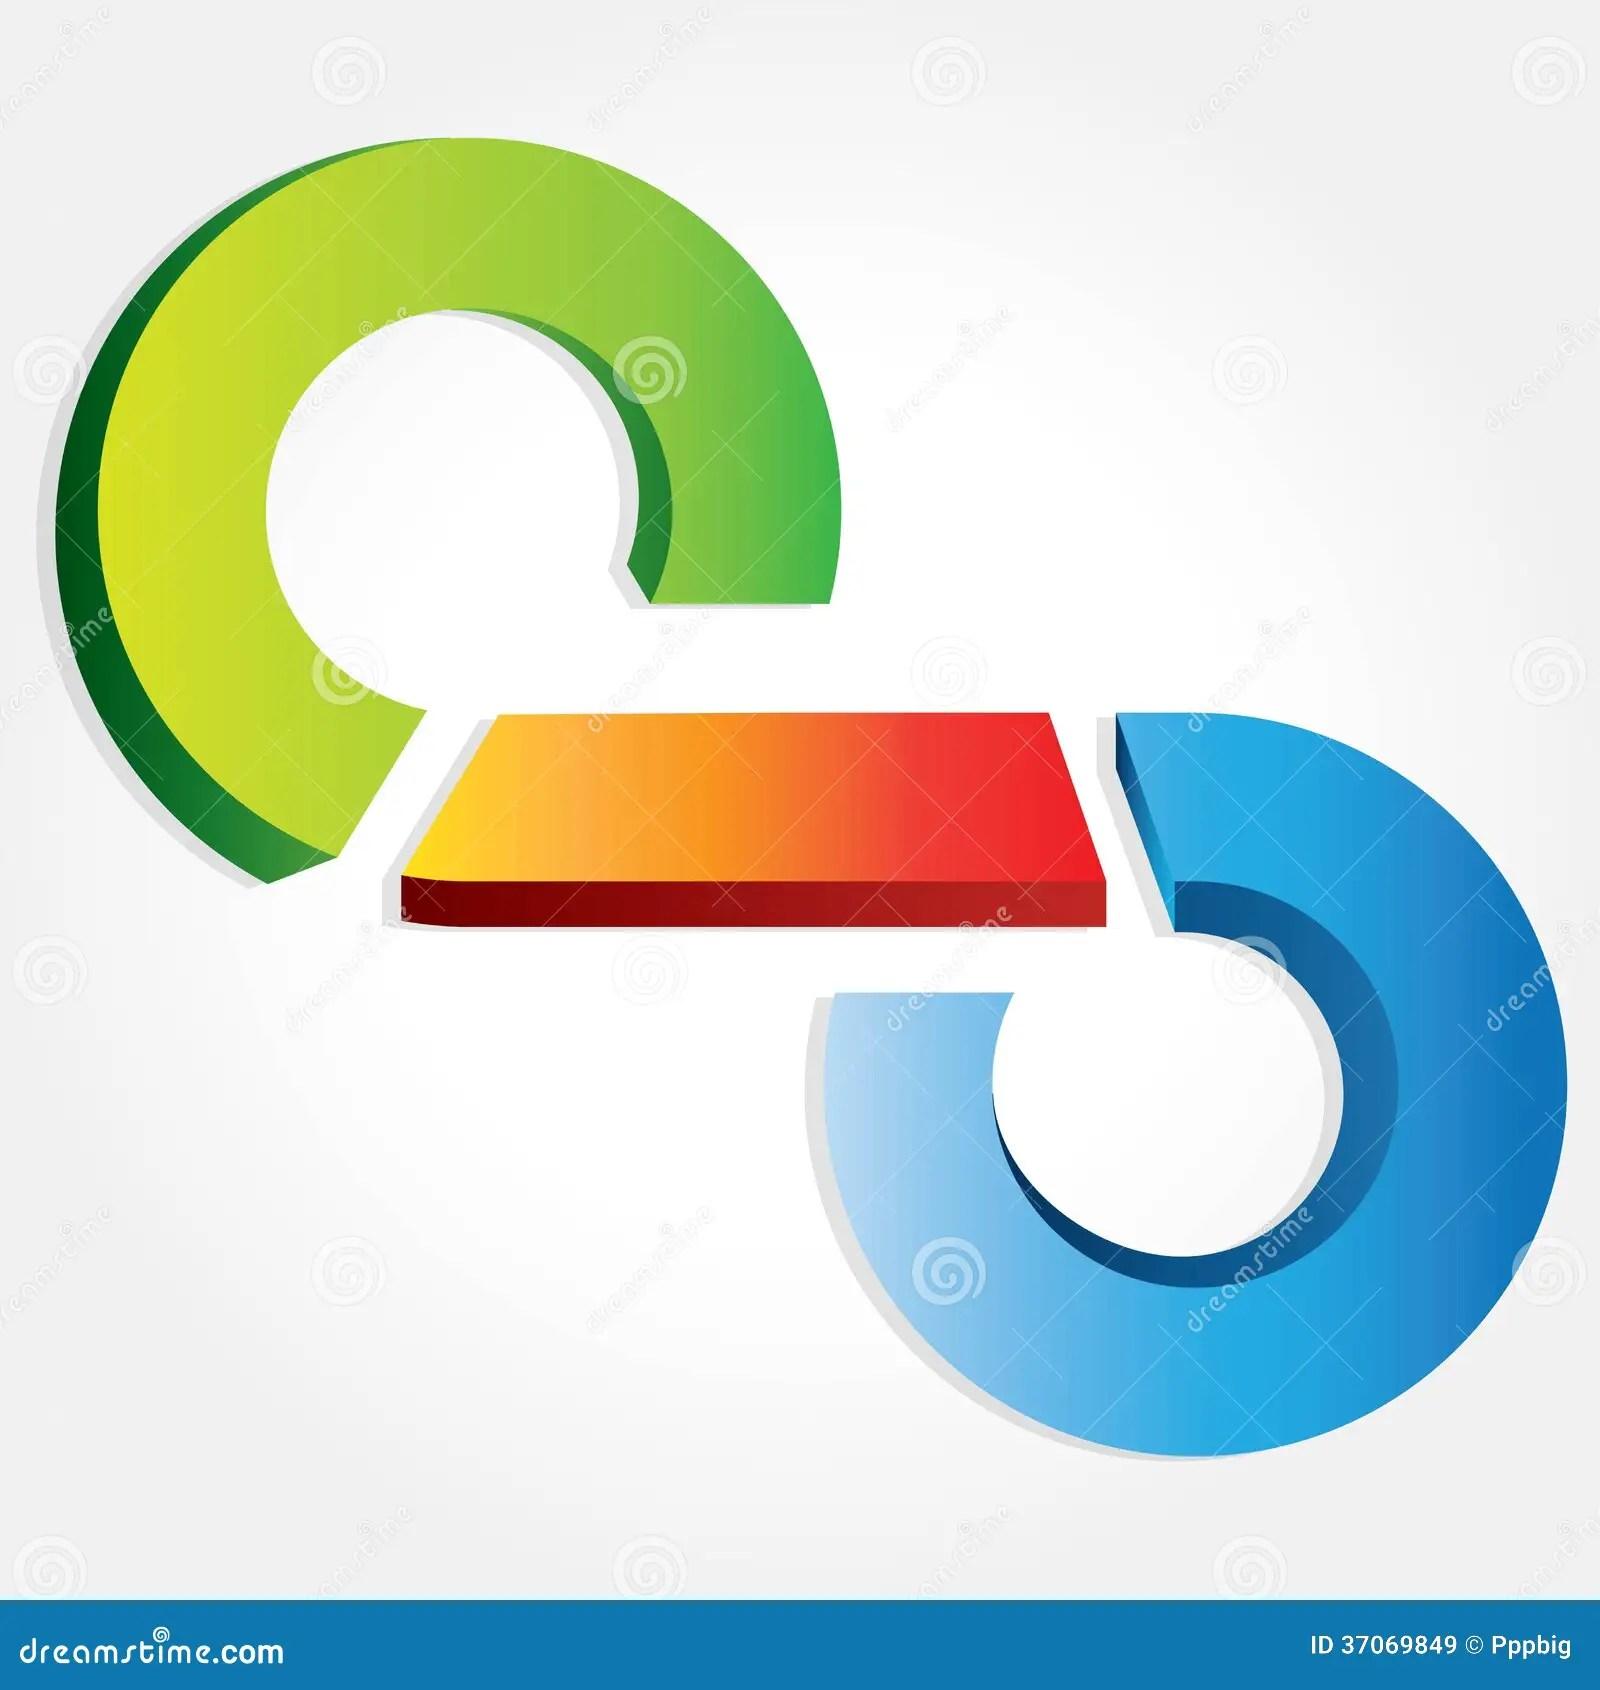 hight resolution of business process flow presentation circular loop diagram